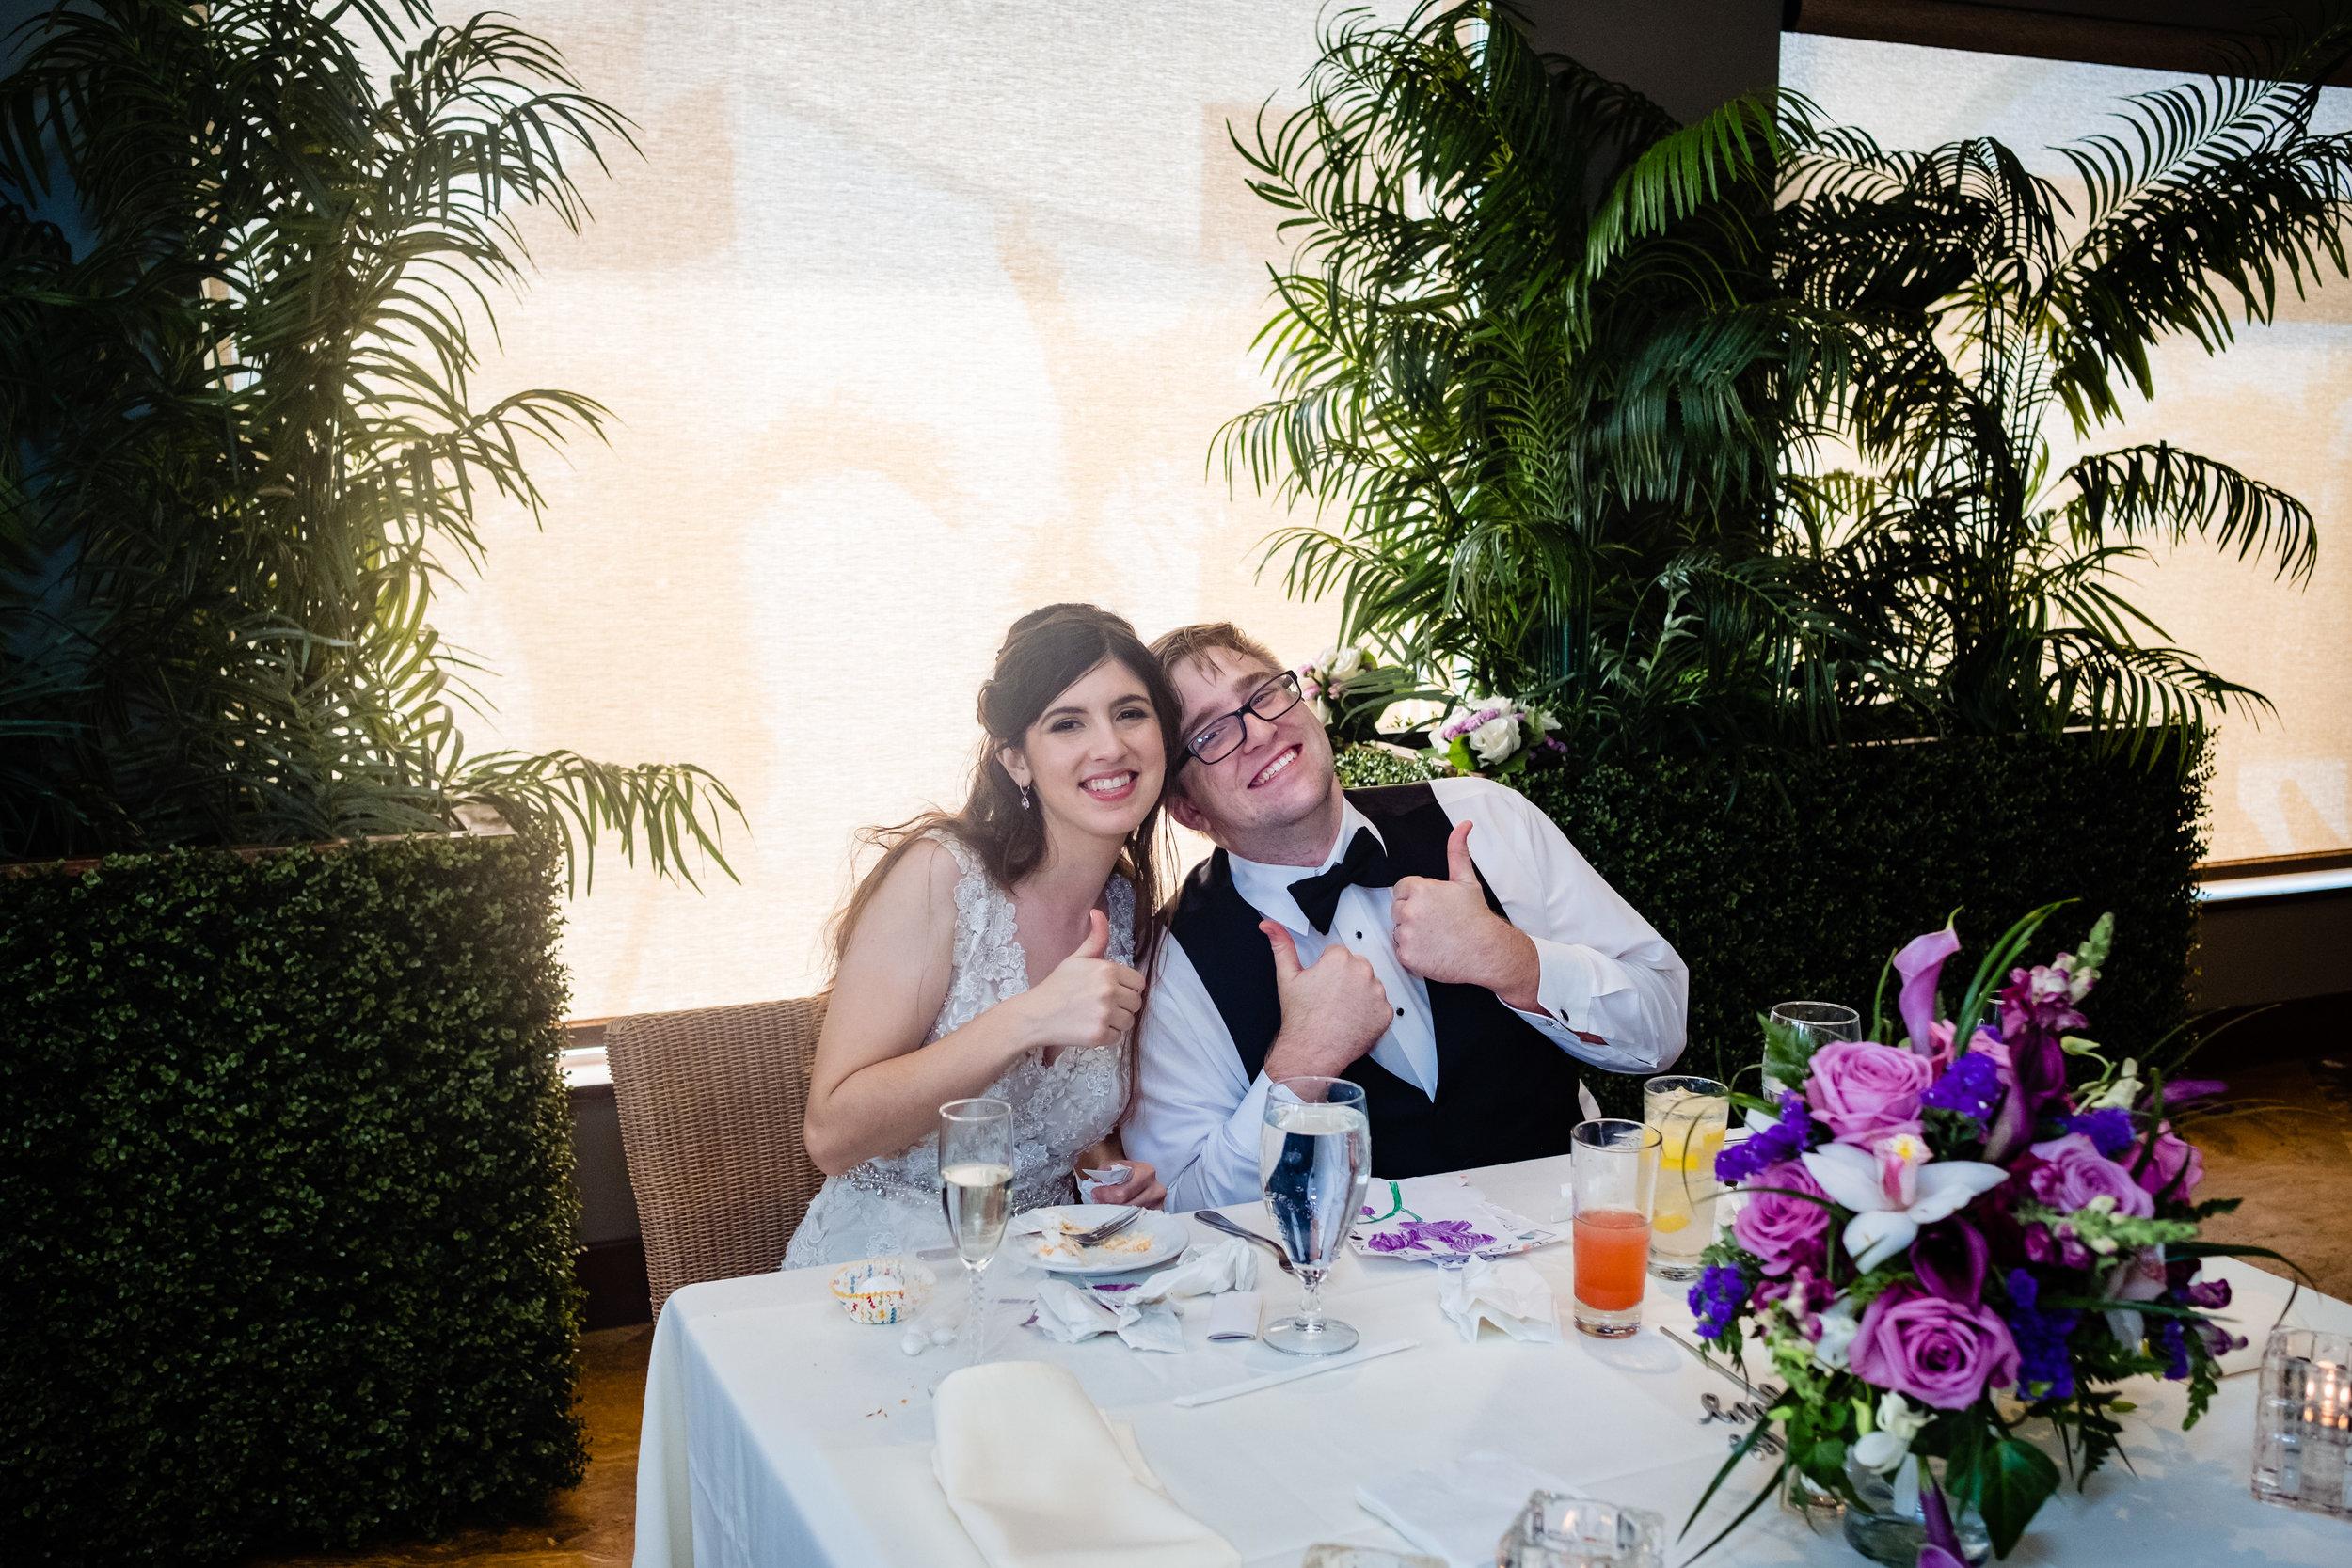 HAH_Zoe and Daniel_Clearwater Wedding_677_2018.jpg